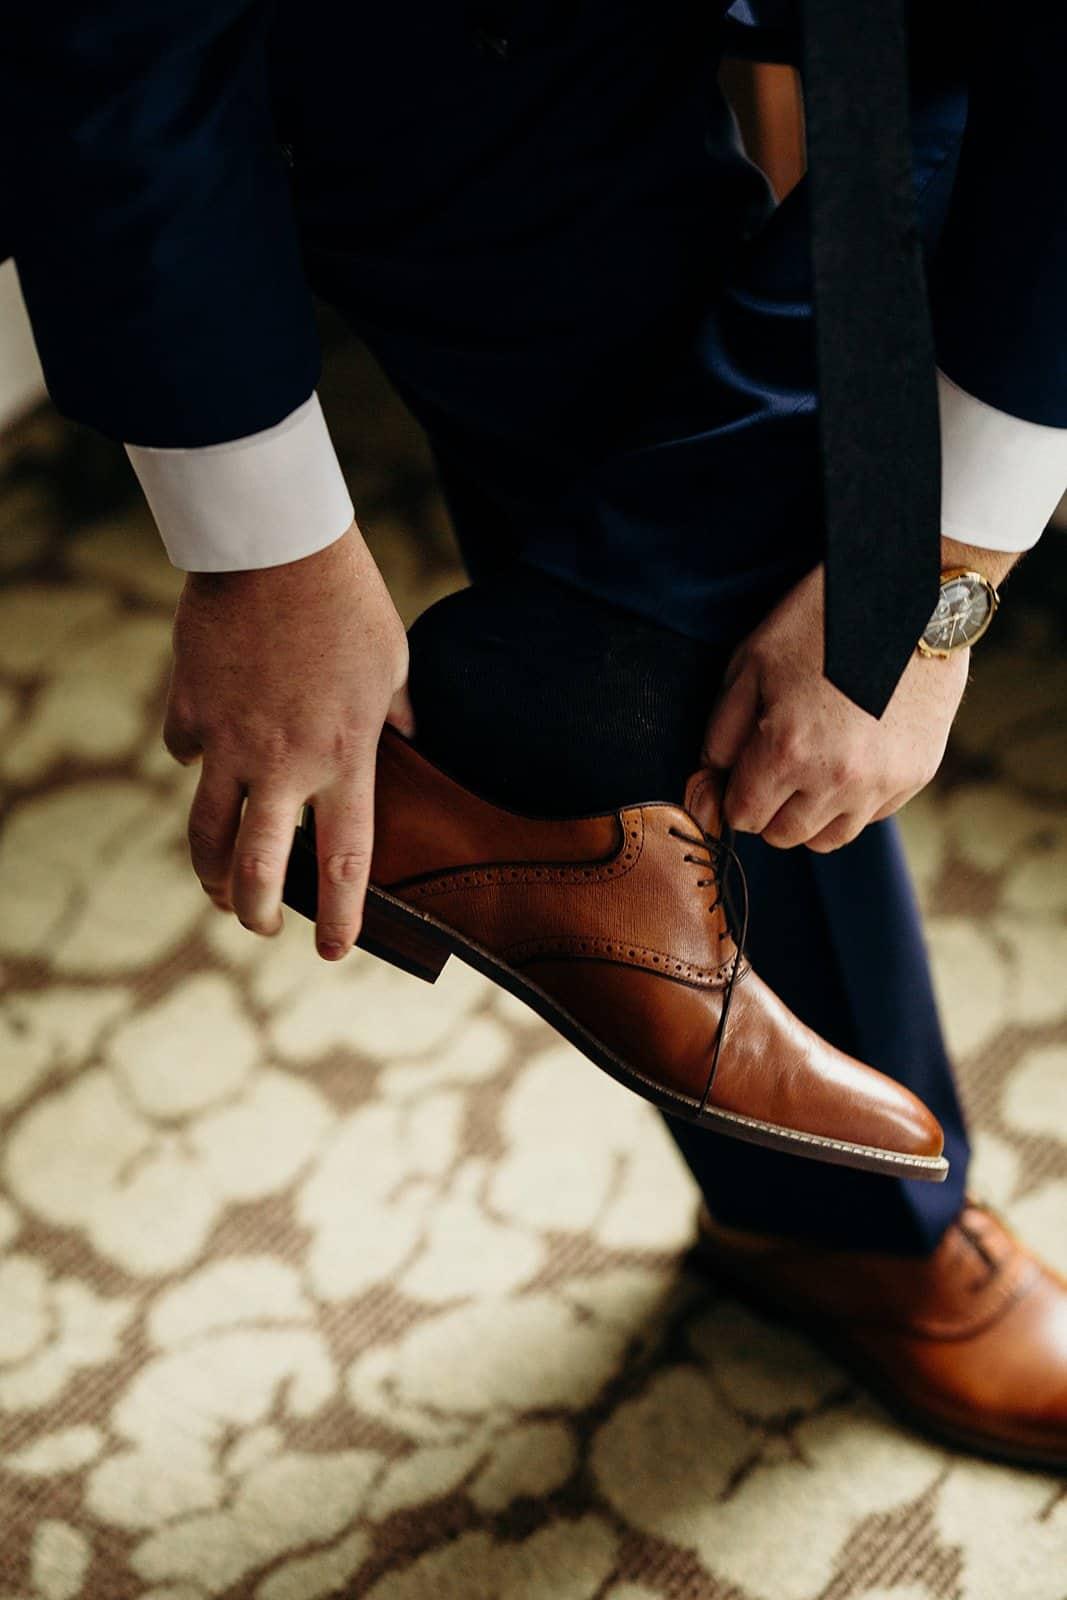 man puts on brown wedding shoes